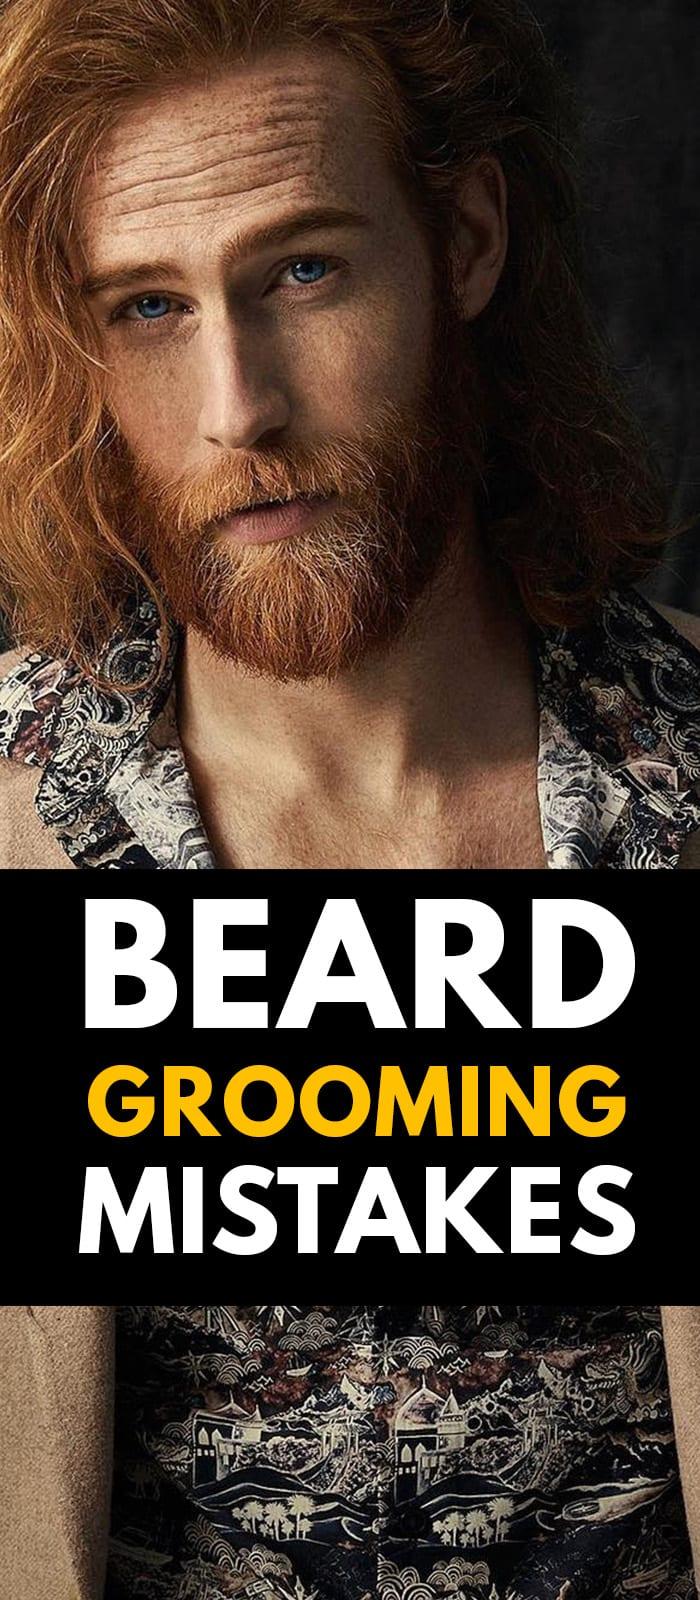 3 Beard Growing Mistakes